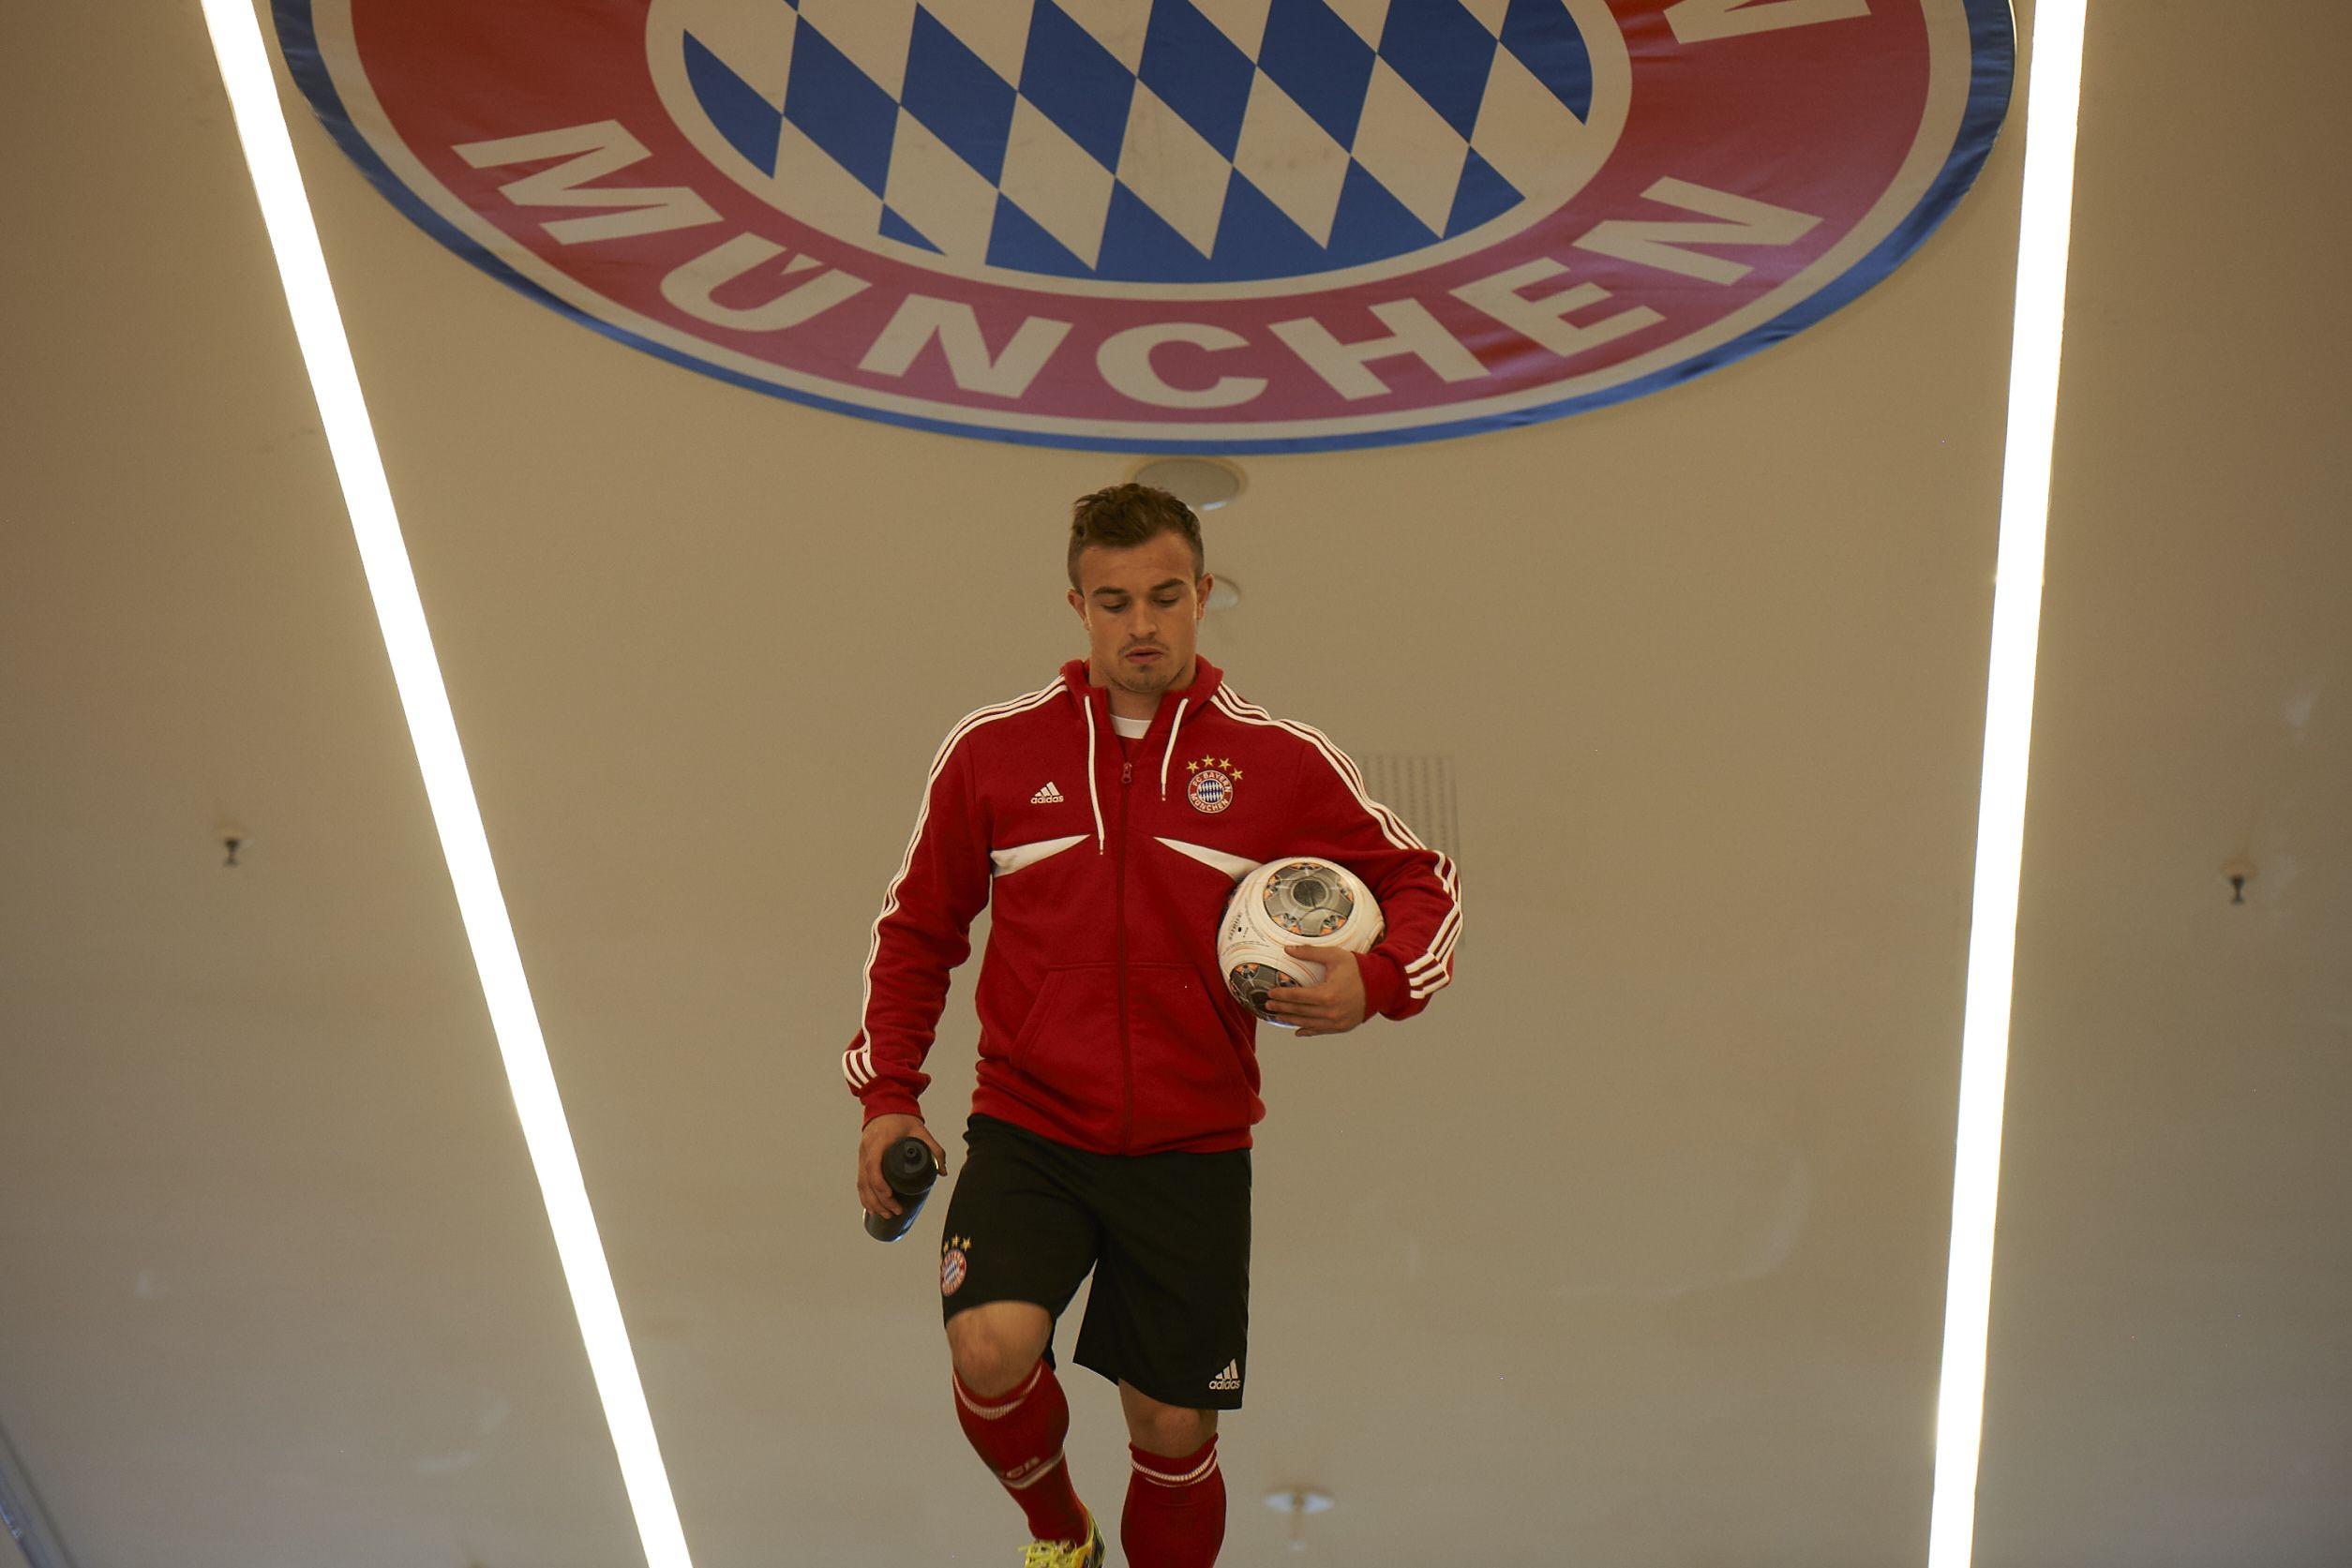 Making Off Allianz Suisse Spot Mit Xherdan Shaqiri With Images Bayern Munich Bayern Character